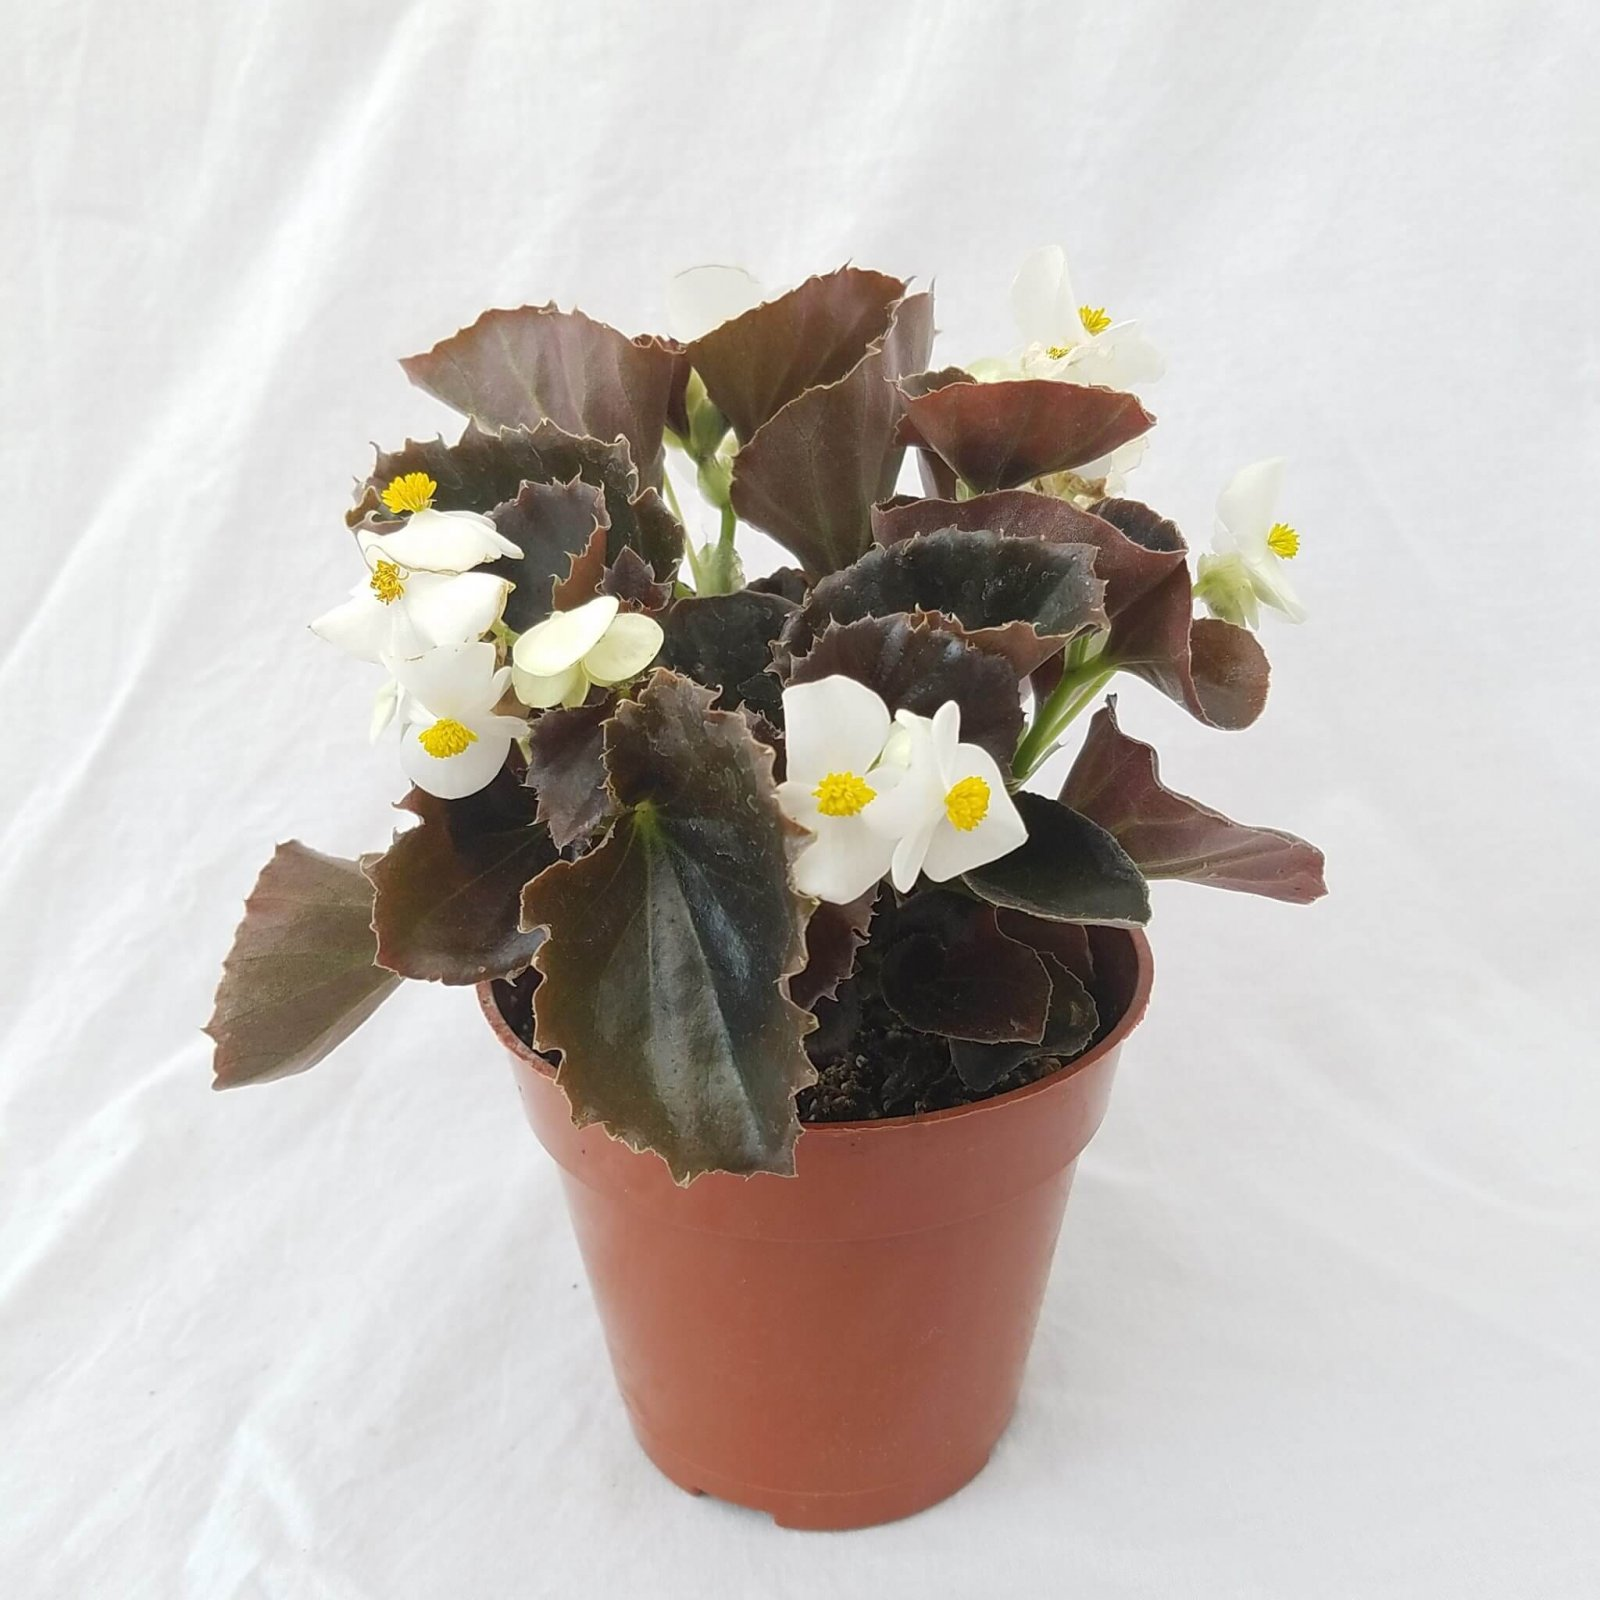 Begonia 'Harmony White' (Bronze Leaf) - 4 1/2